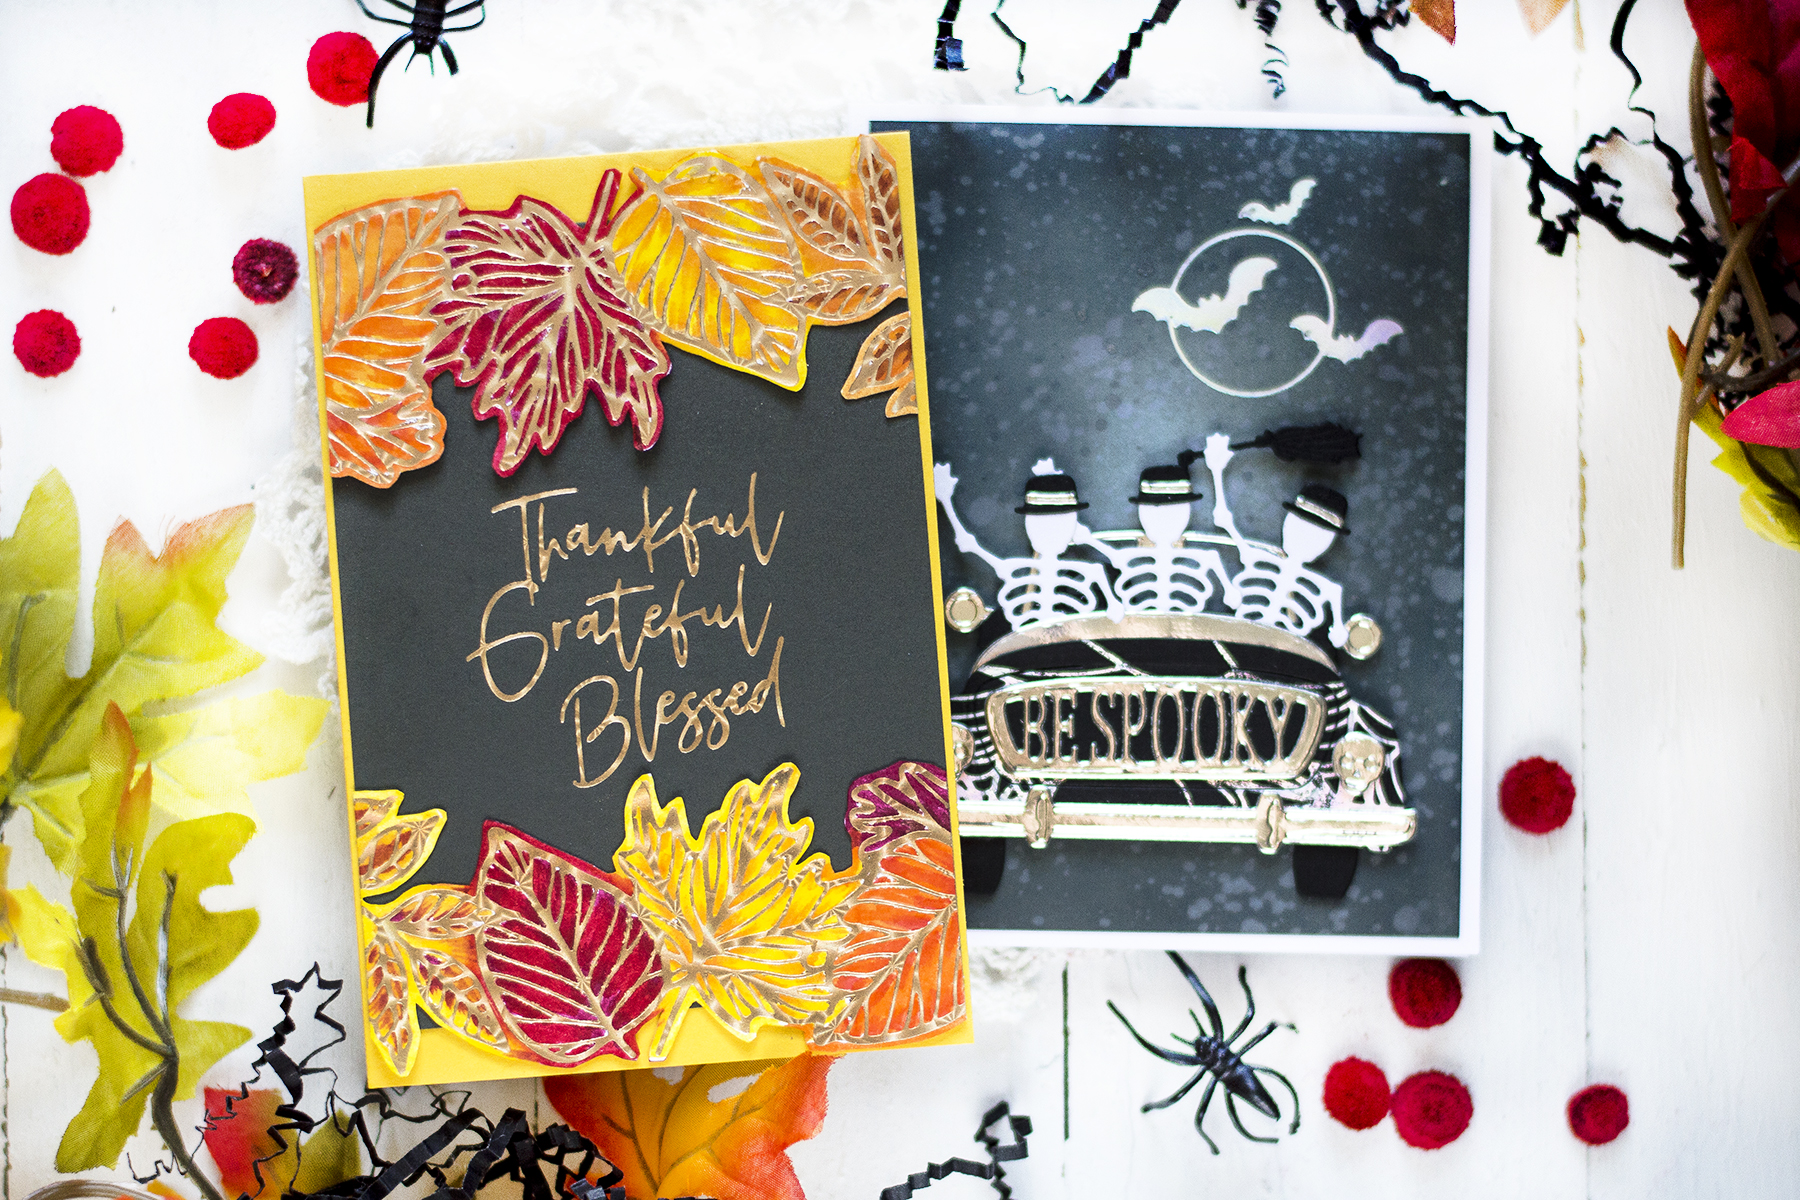 Fall Holiday Cards. Cards by Svitlana Shayevich